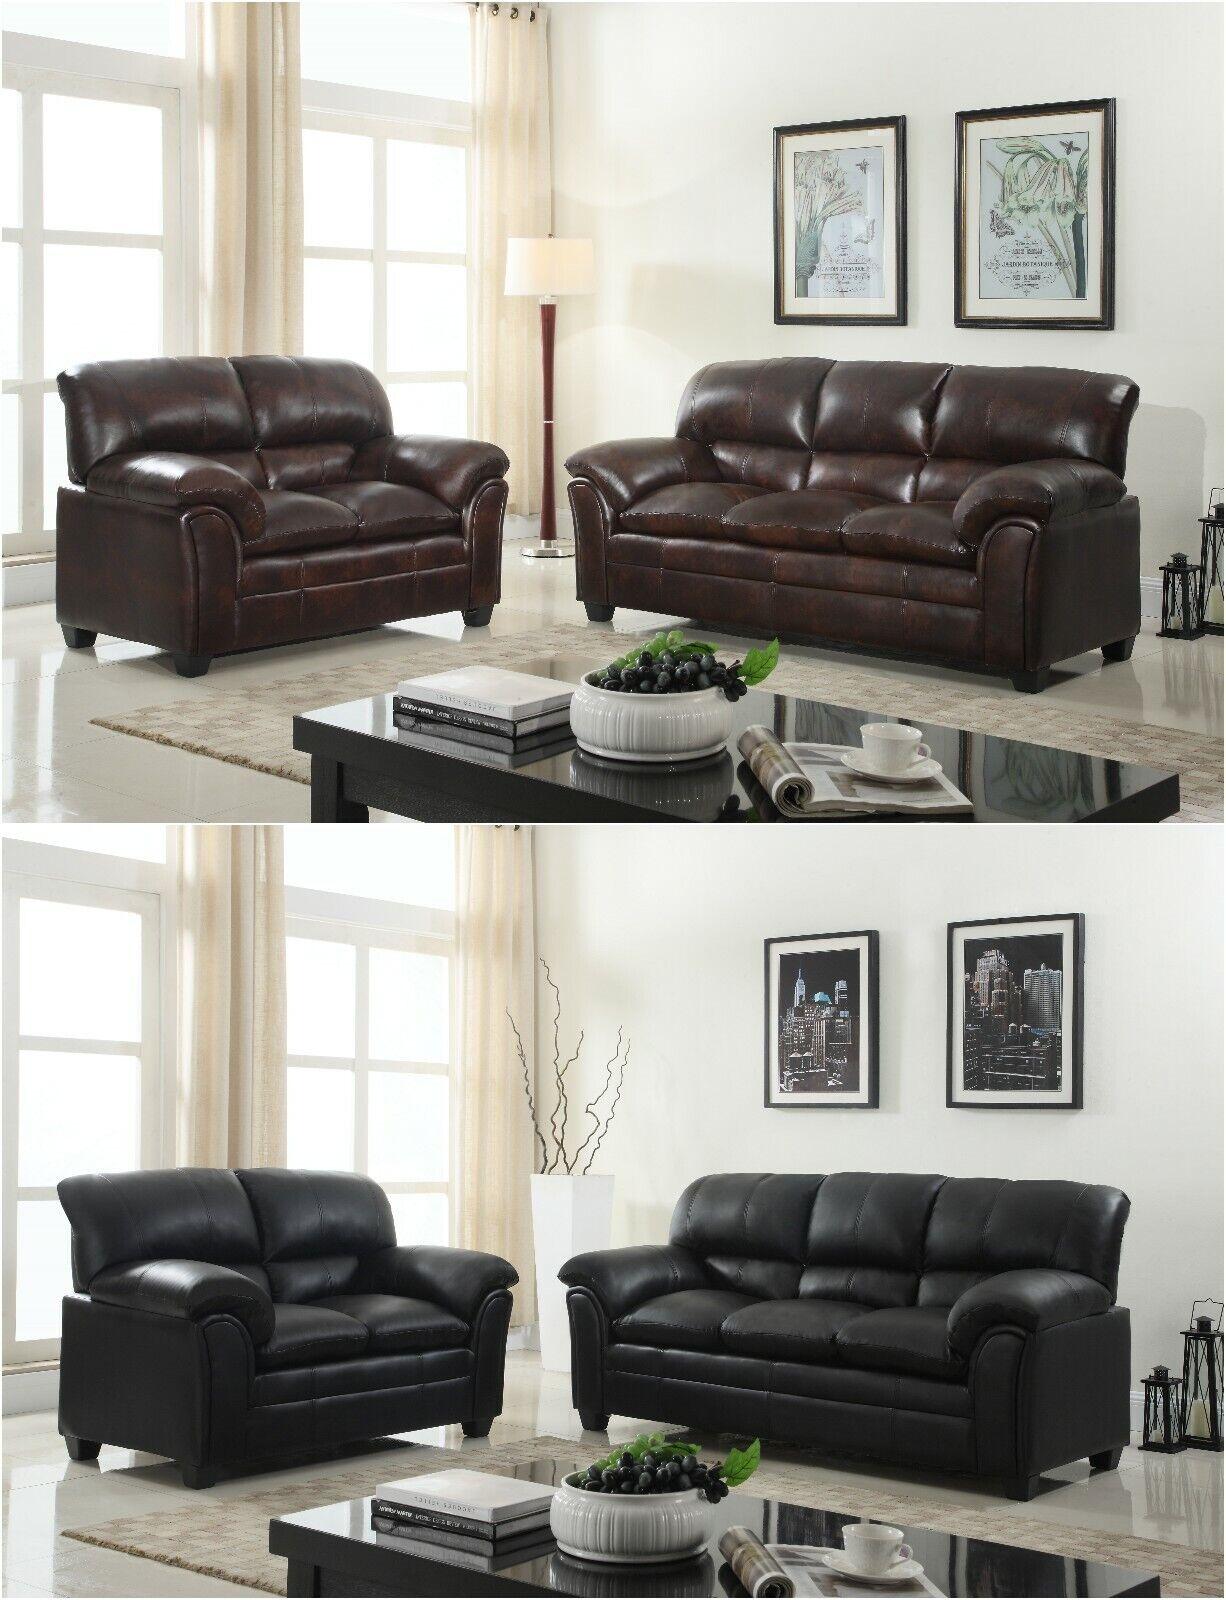 Strange Brandnew Contemporary Pu Leather Sofa Loveseat Living Room Furniture Couch Set Spiritservingveterans Wood Chair Design Ideas Spiritservingveteransorg